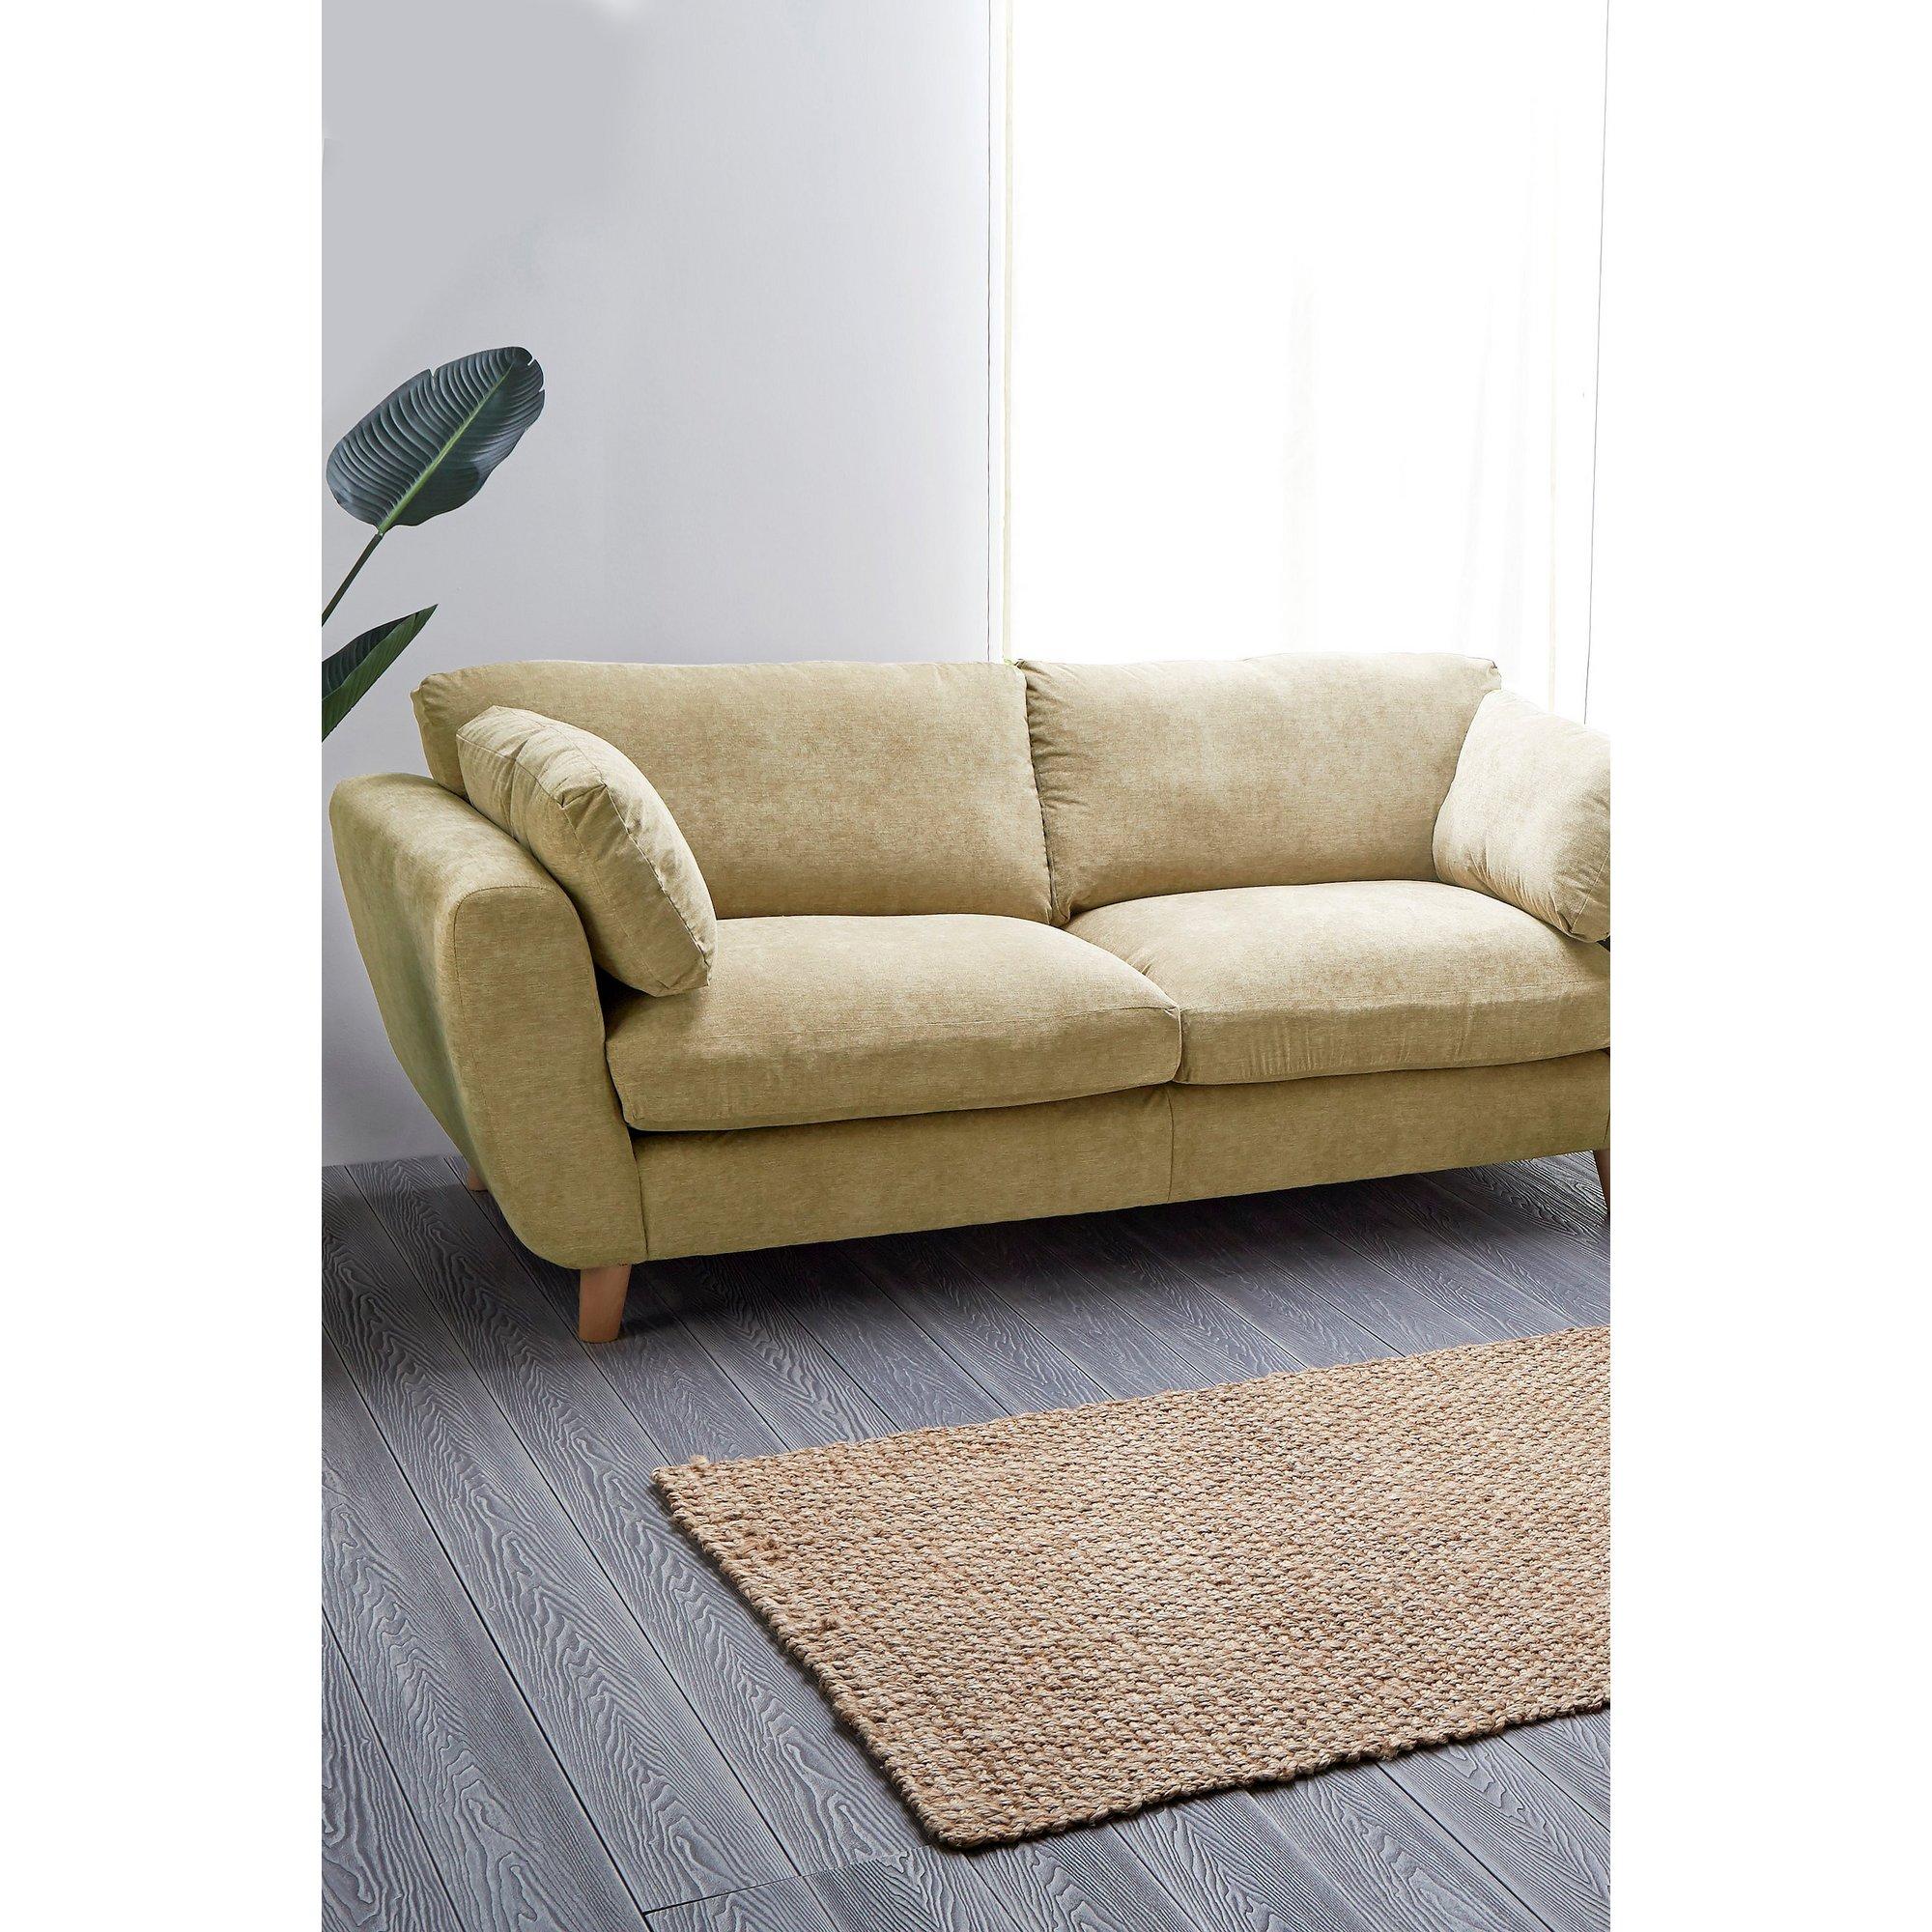 Image of Avon 3 Seater Sofa